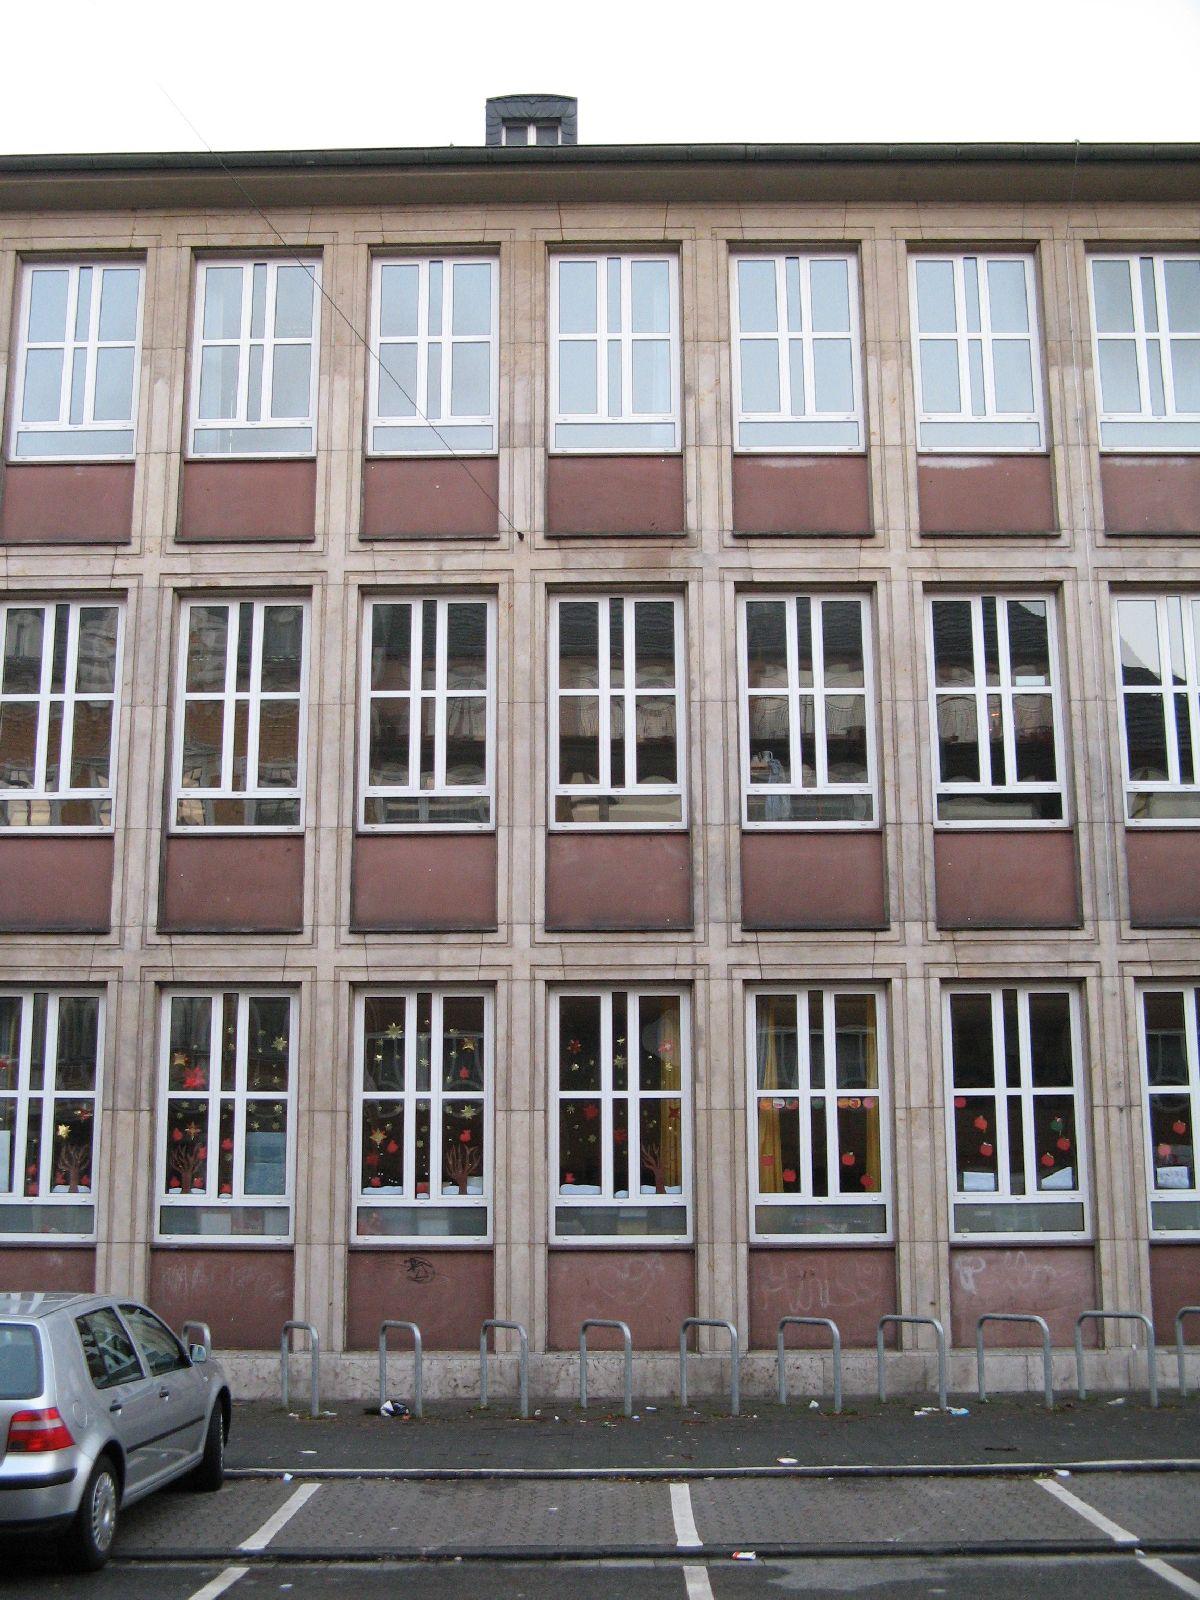 Building_Texture_B_1266